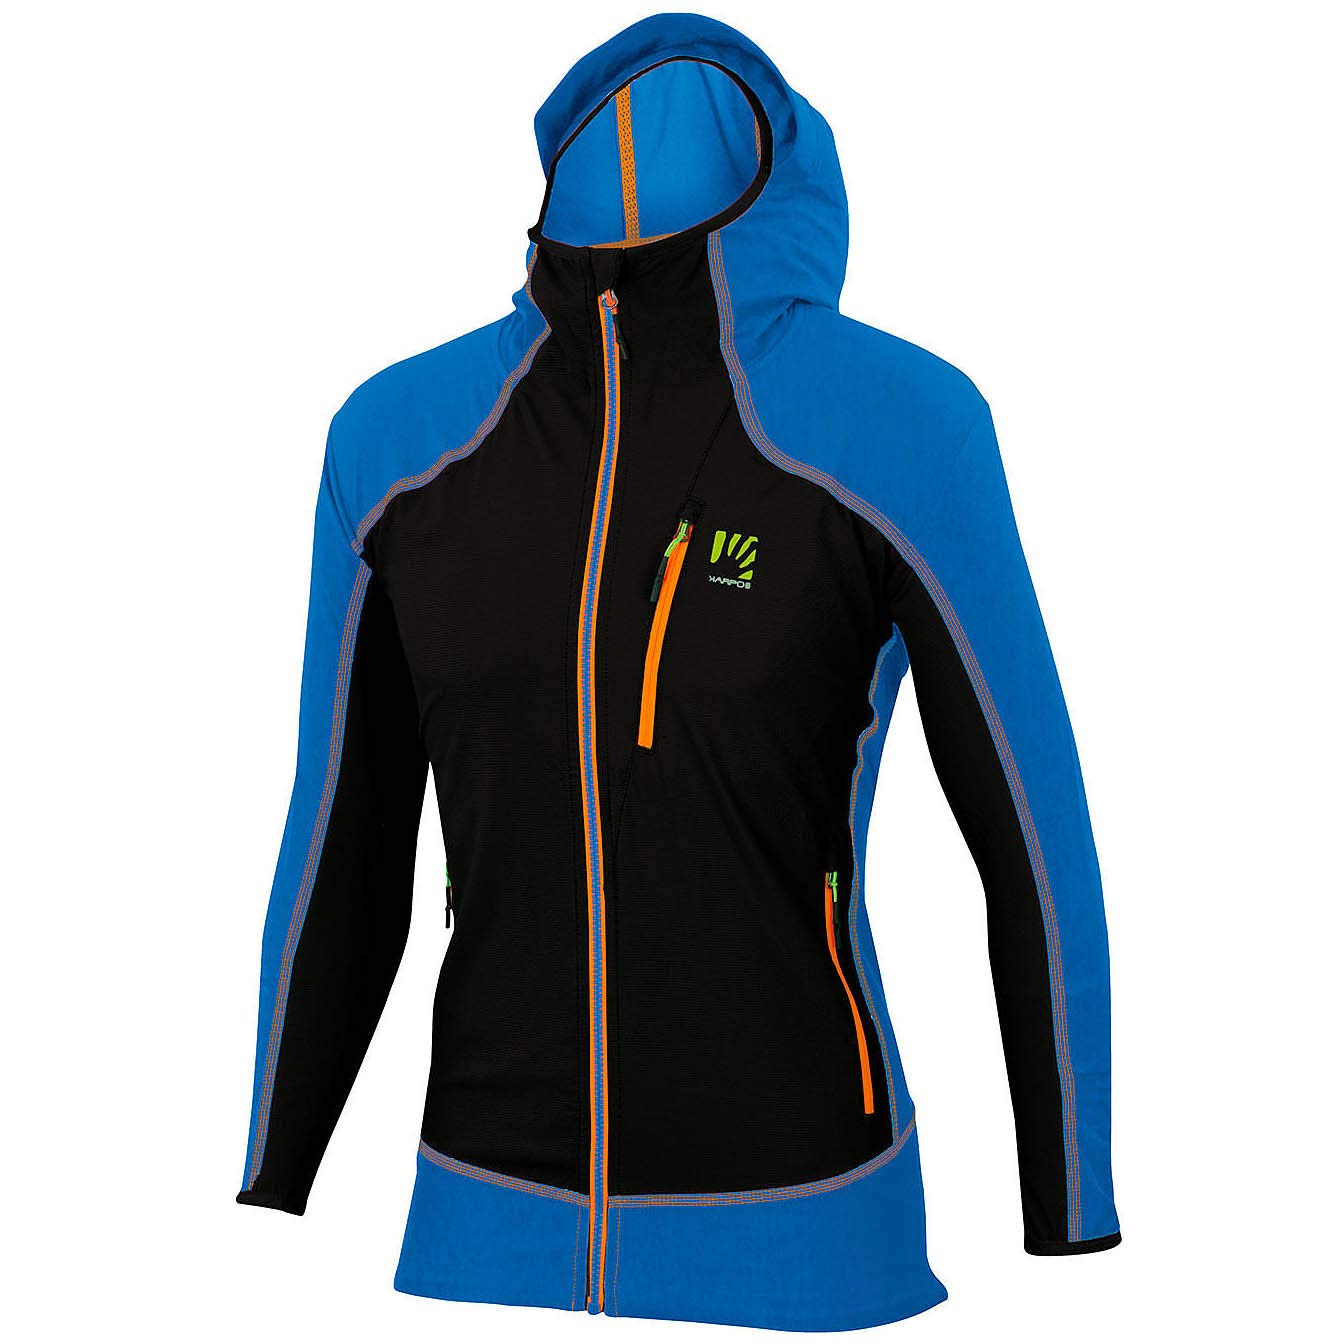 Karpos Parete Jacket - Bluette/Black